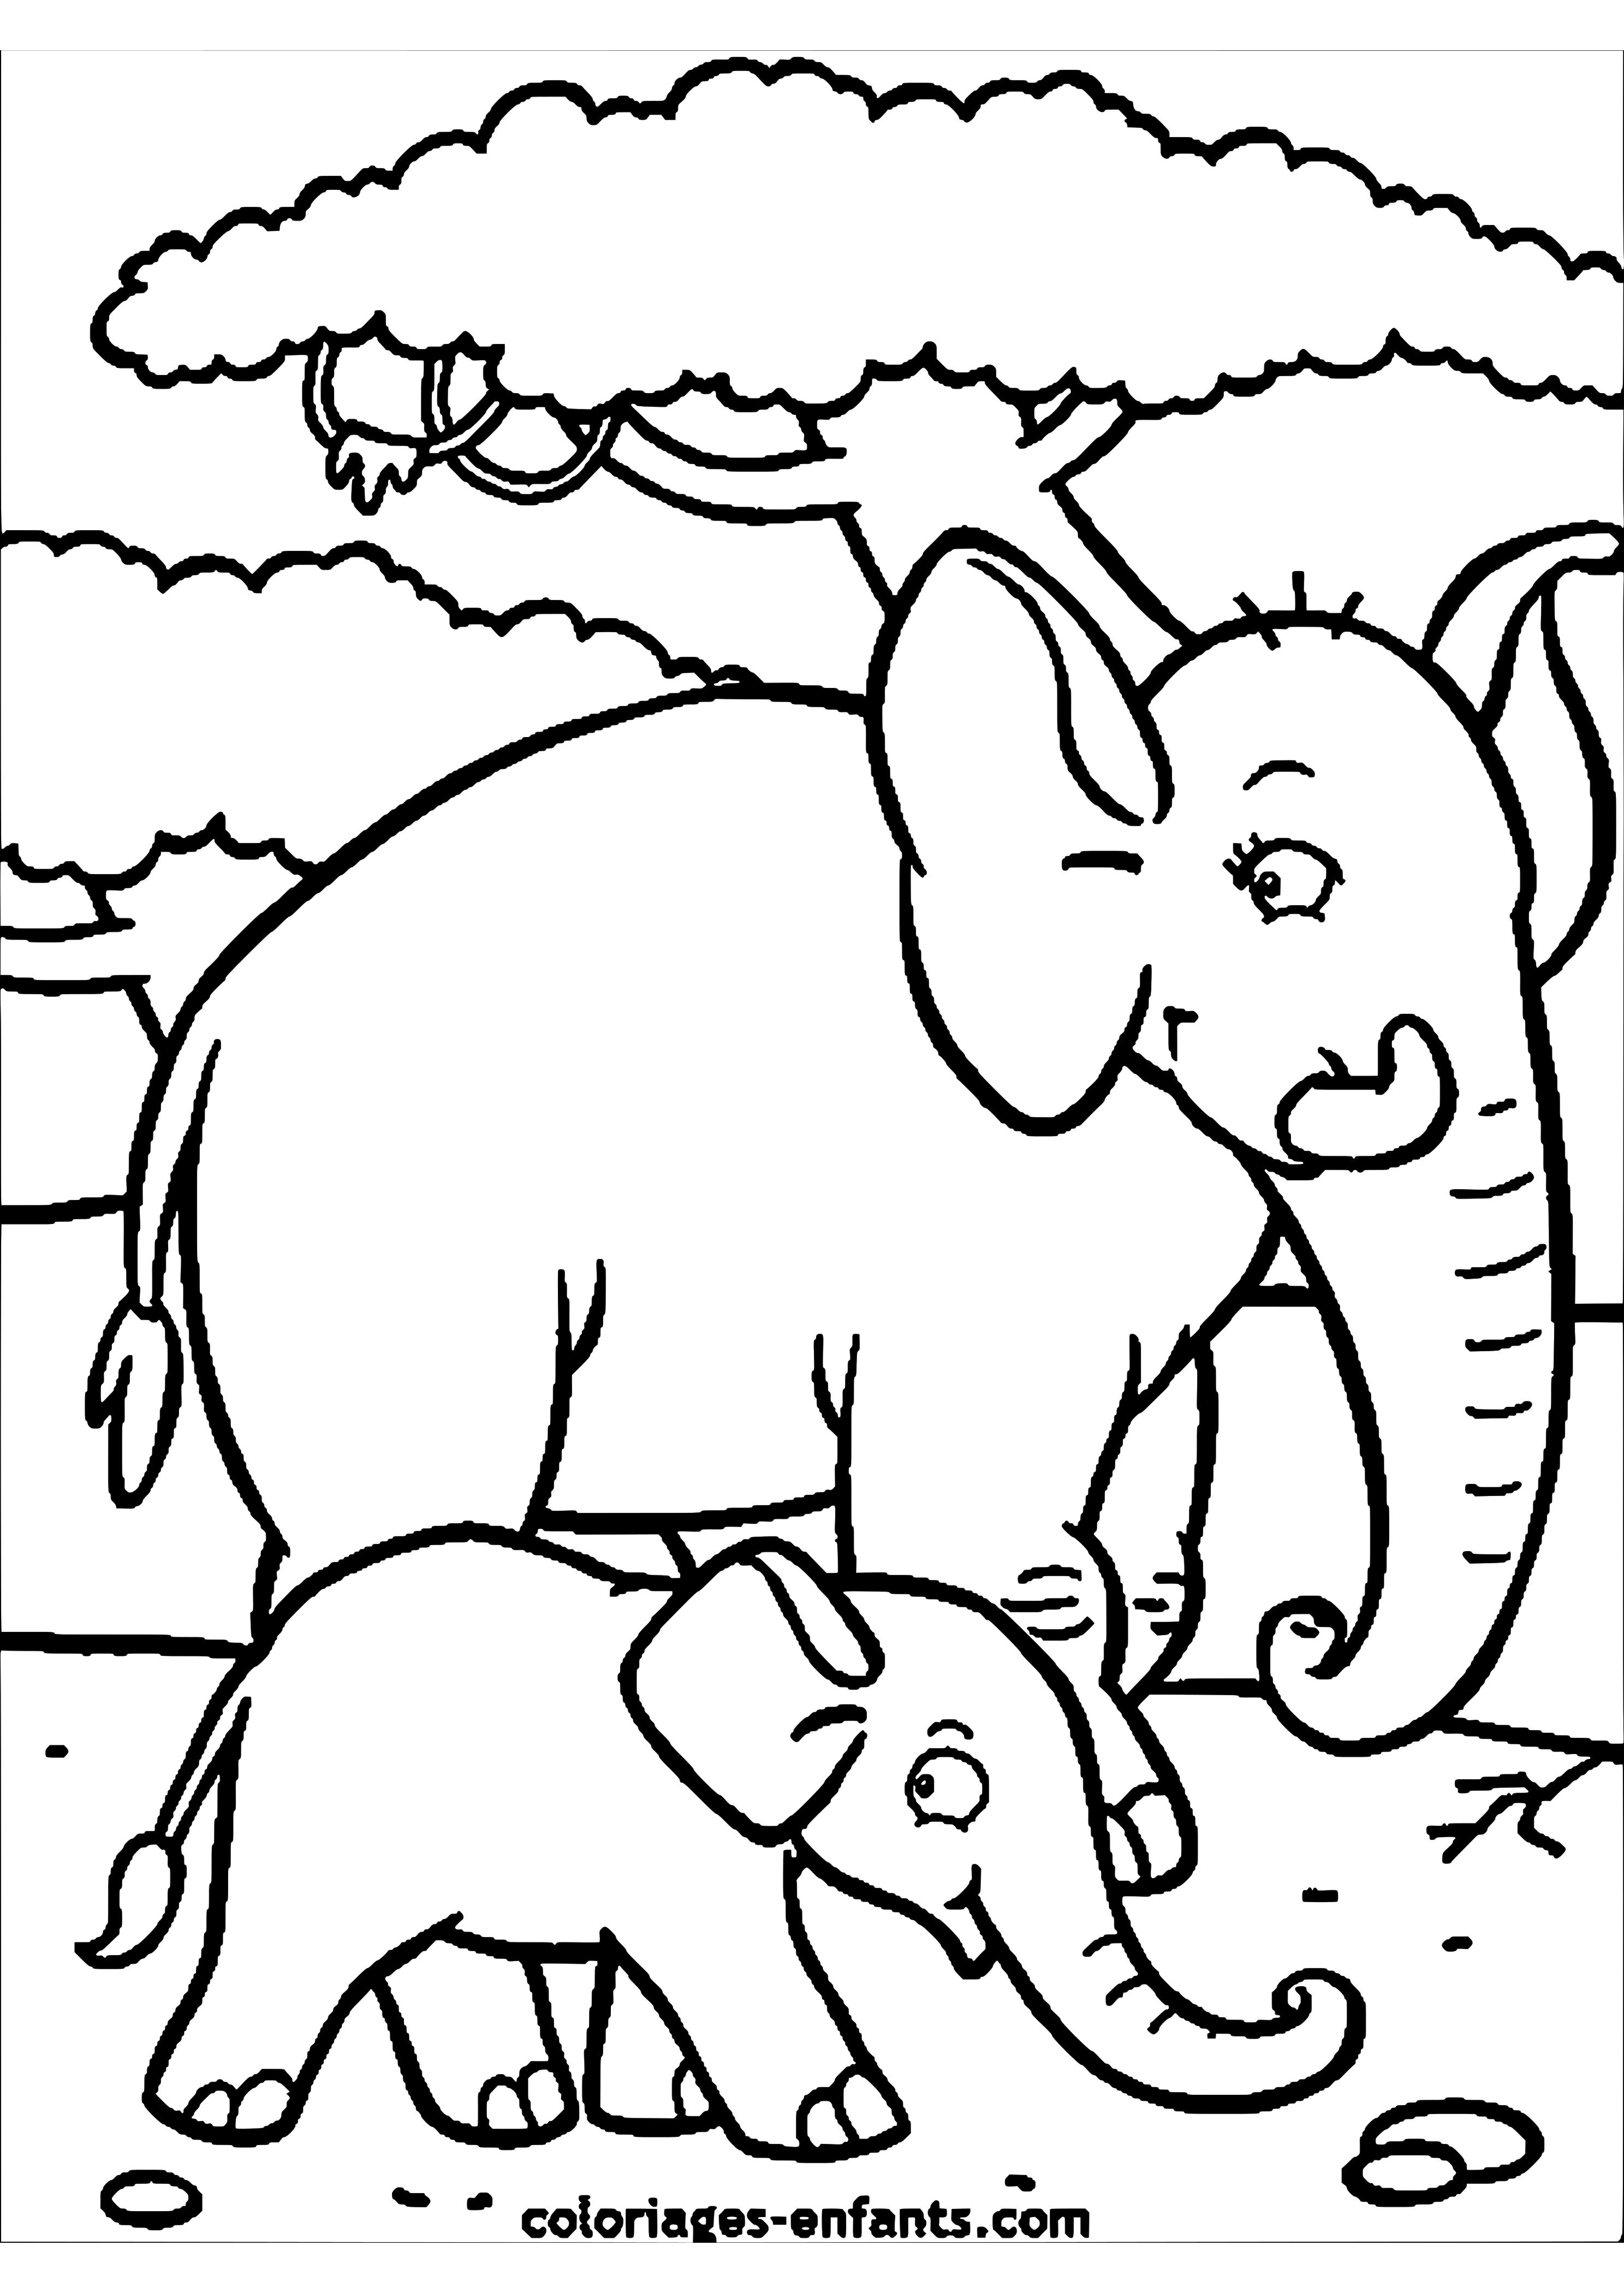 Zoo Activites Maternelle Dibujos Para Imprimir Prefix Elefantes De La Suerte Farm Animal Coloring Pages Animal Coloring Pages Coloring Pages